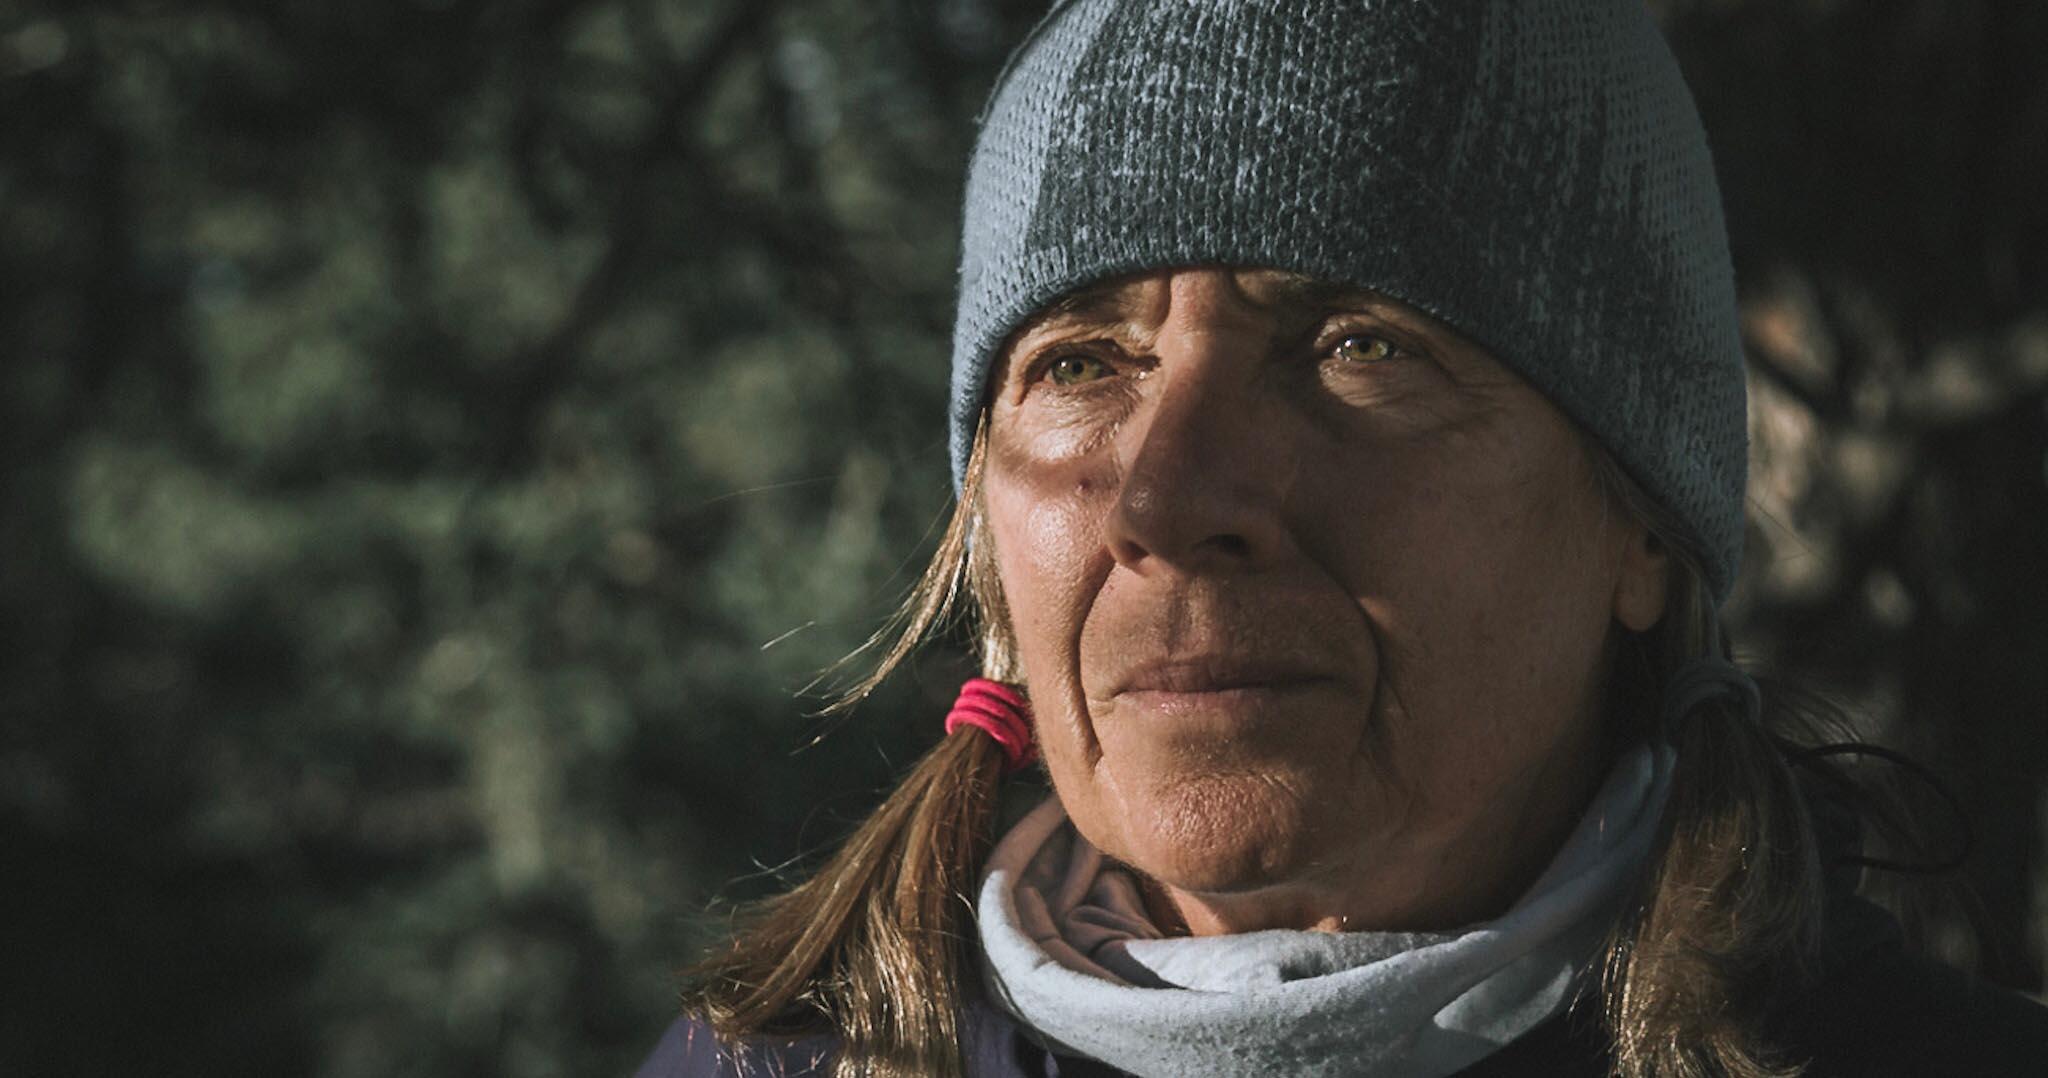 Backcountry guide Cindy Gagnon (Photo by Josh Vertucci)